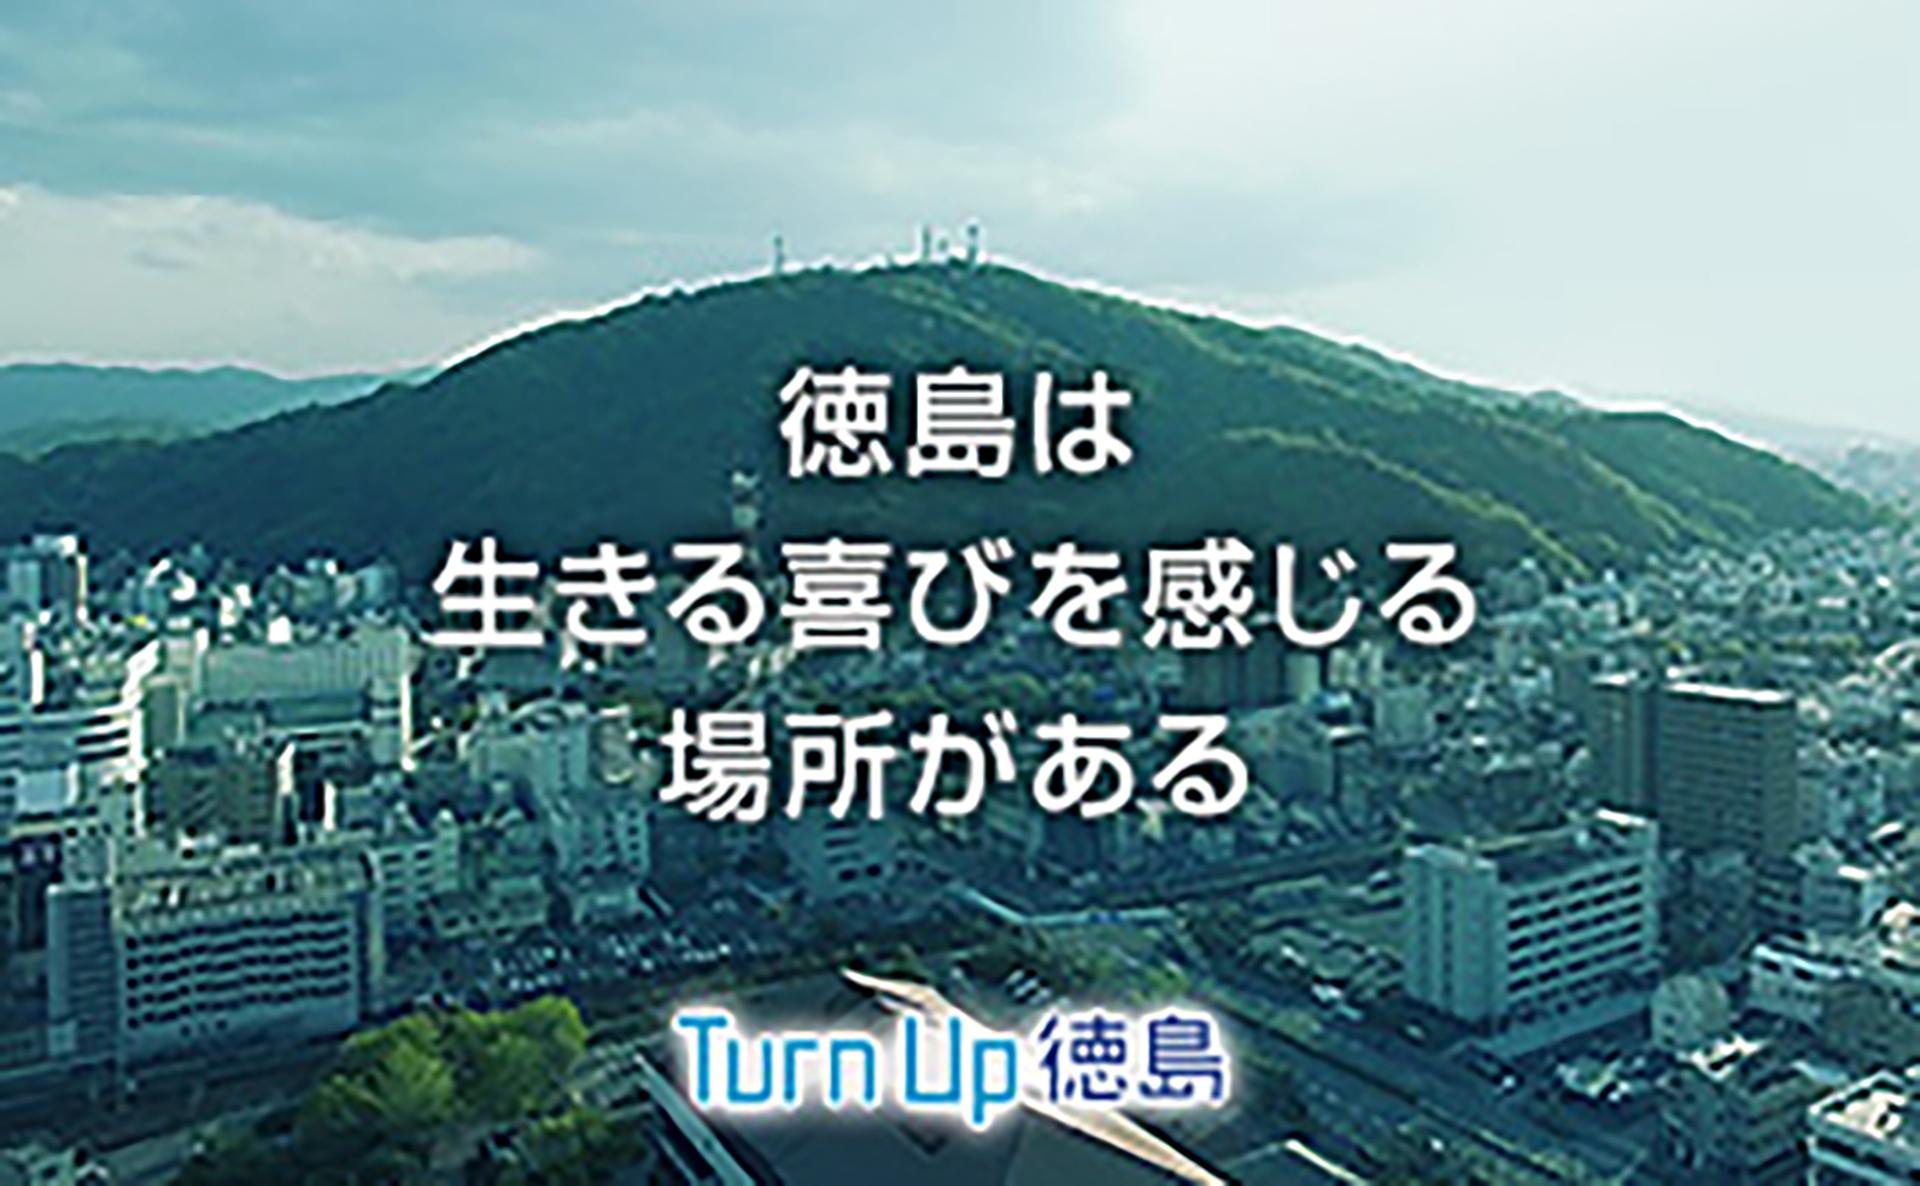 8 TurnUpサムネイル画像.jpg